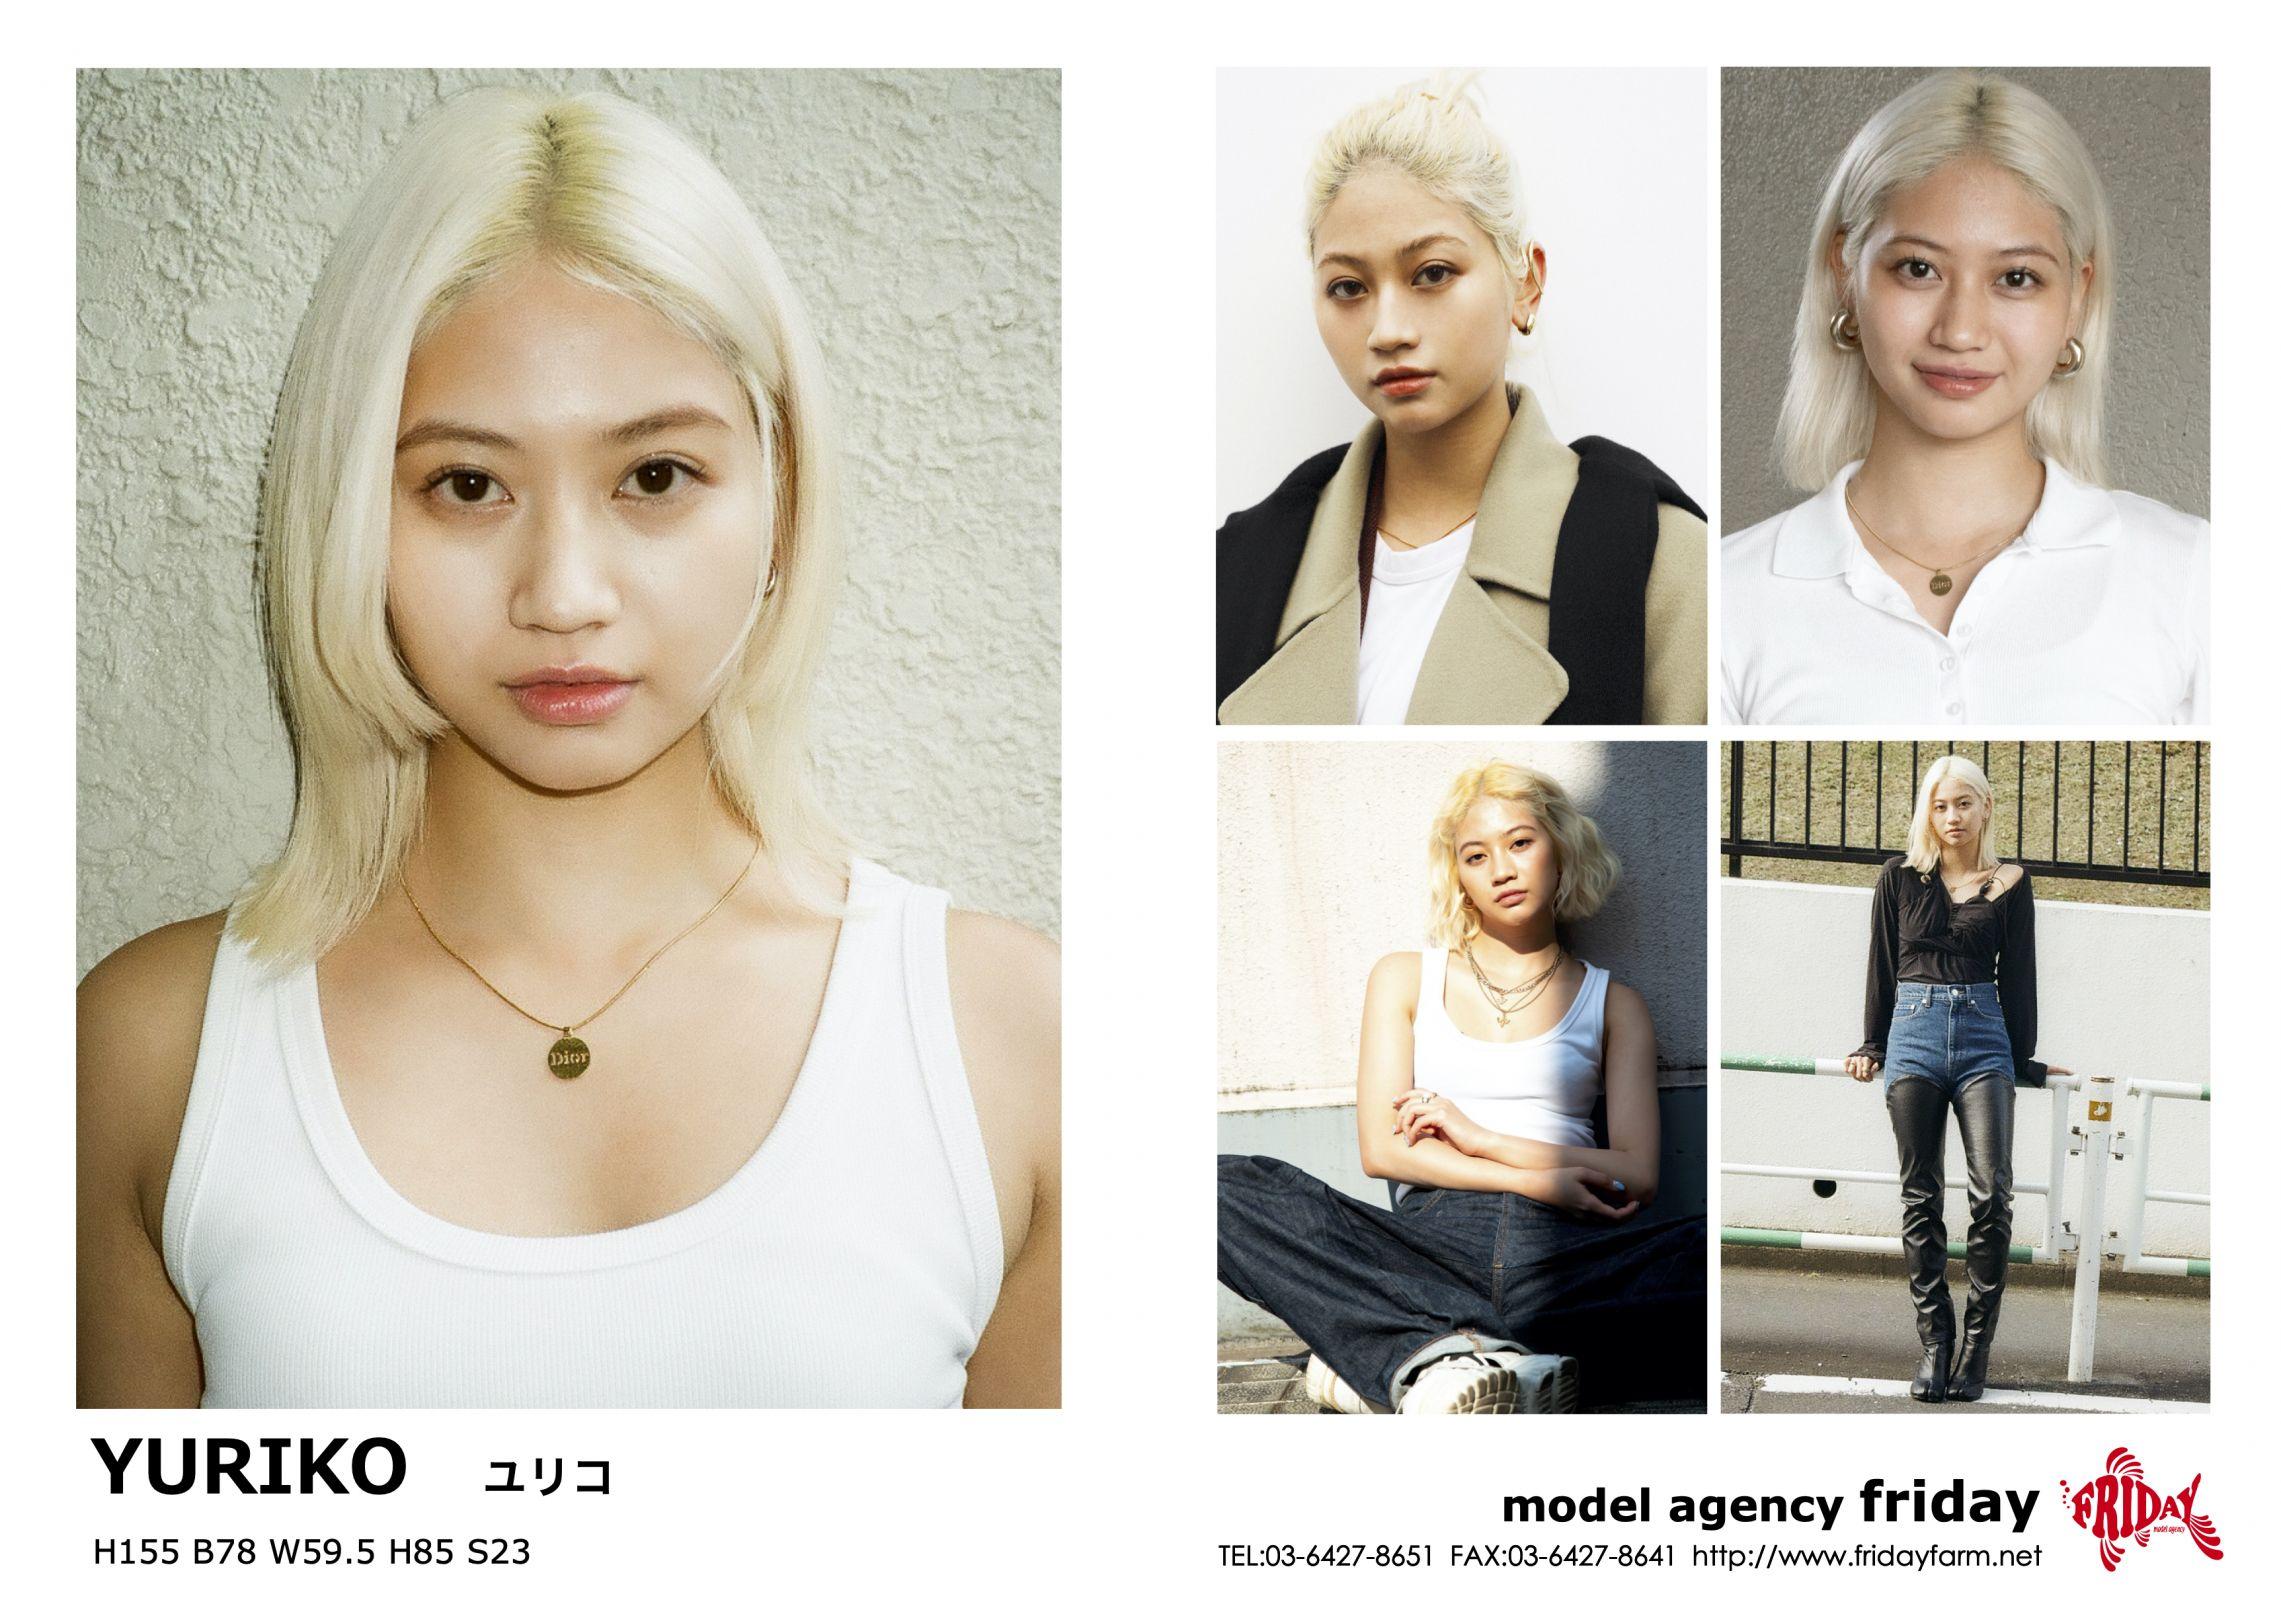 YURIKO - ユリコ | model agency friday